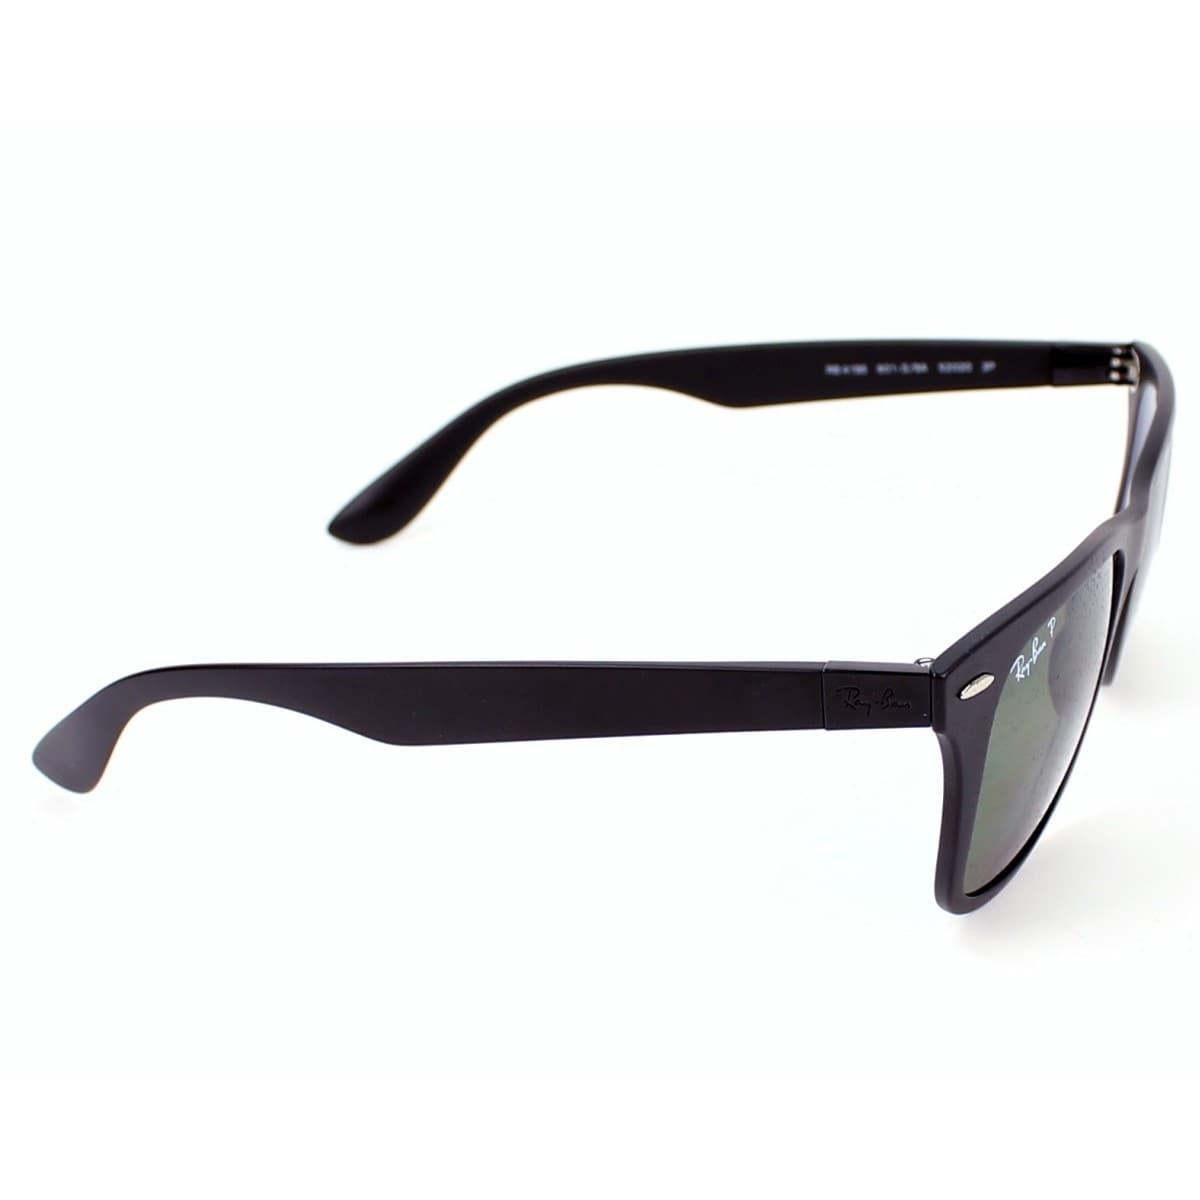 003720e8b Shop Ray-Ban Wayfarer Liteforce Tech RB4195 Black Frame Green Polarized  Lens Sunglasses - Free Shipping Today - Overstock - 10314356